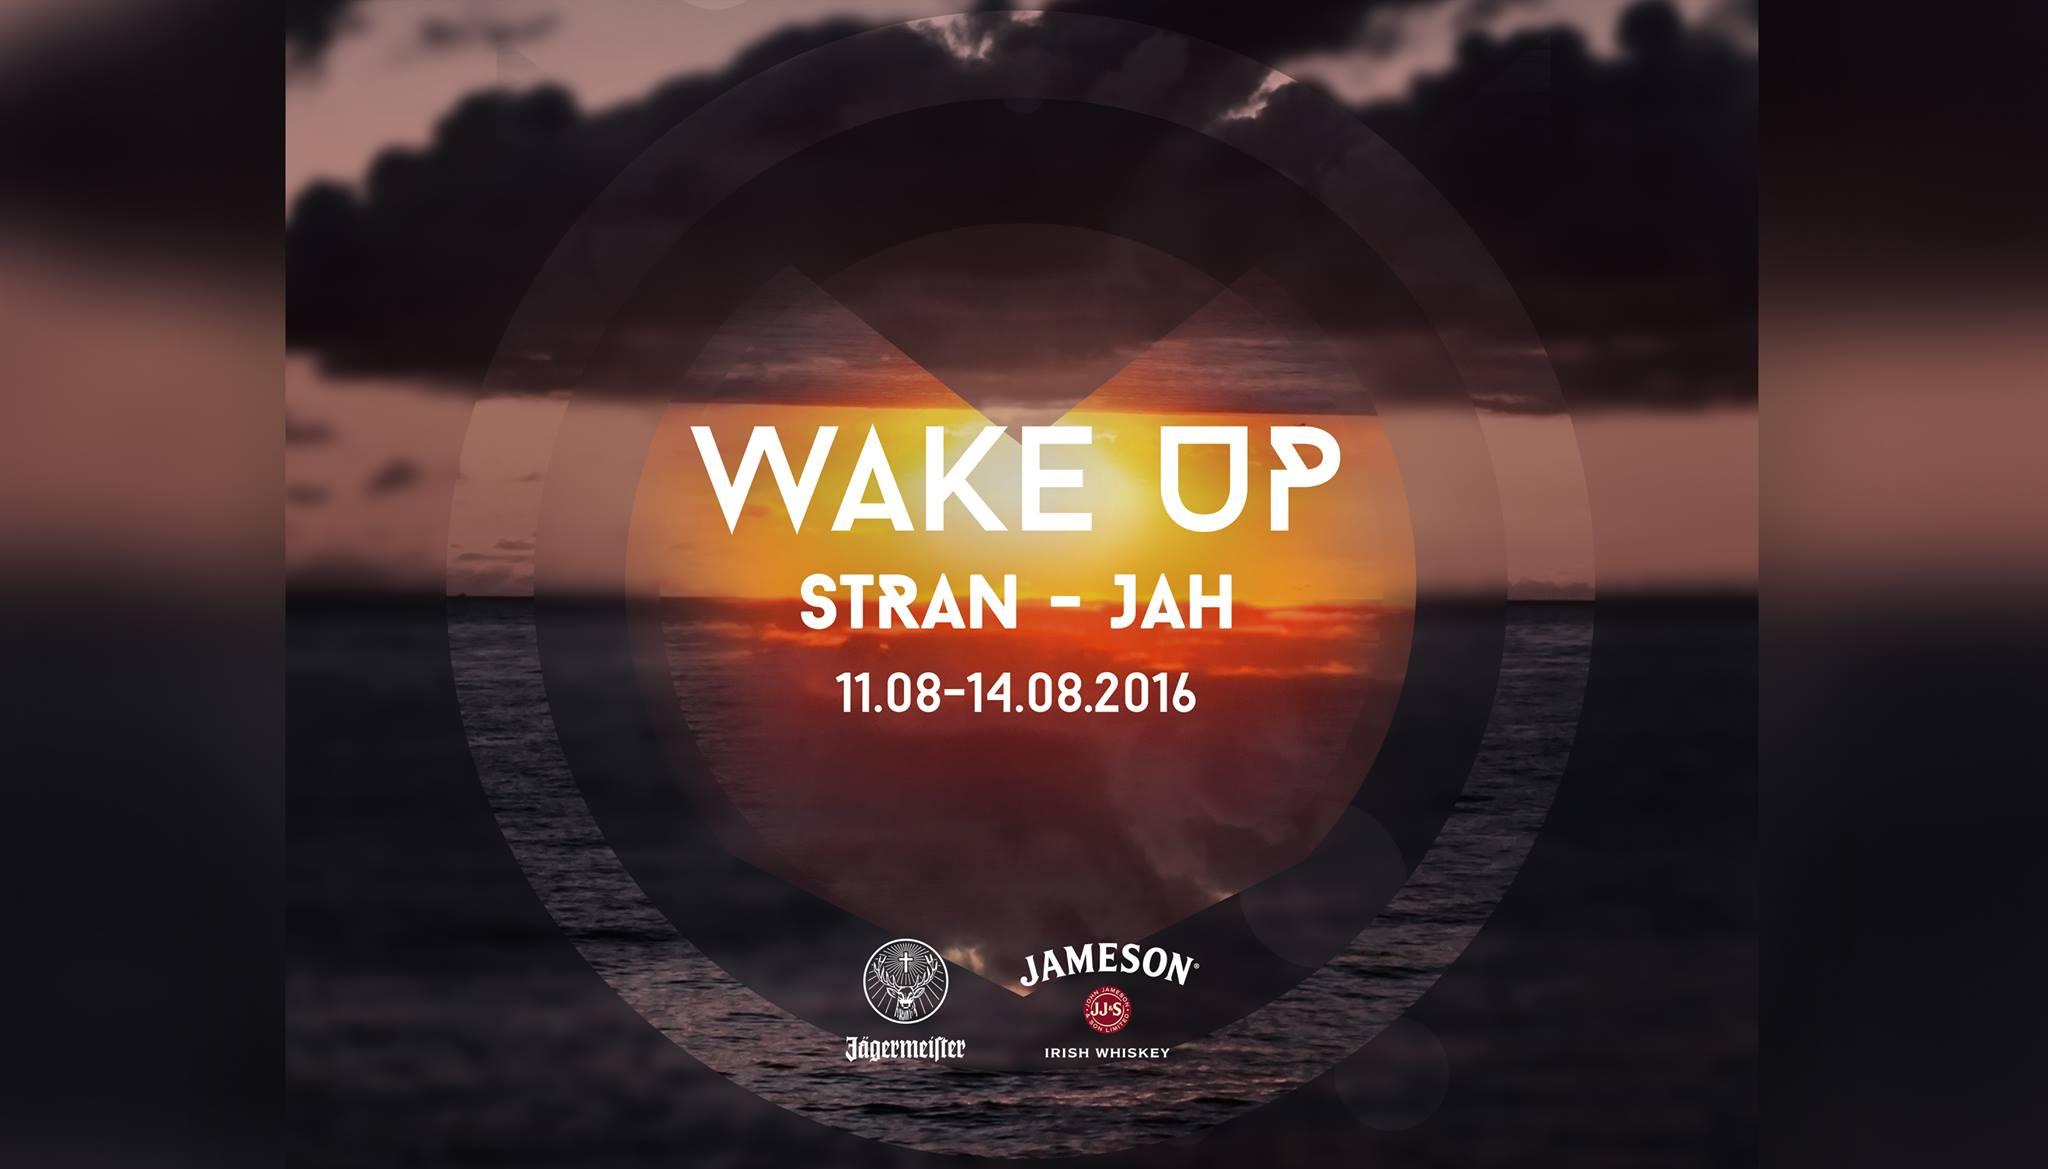 Wake Up Stran-Jah 2016 - село Варвара